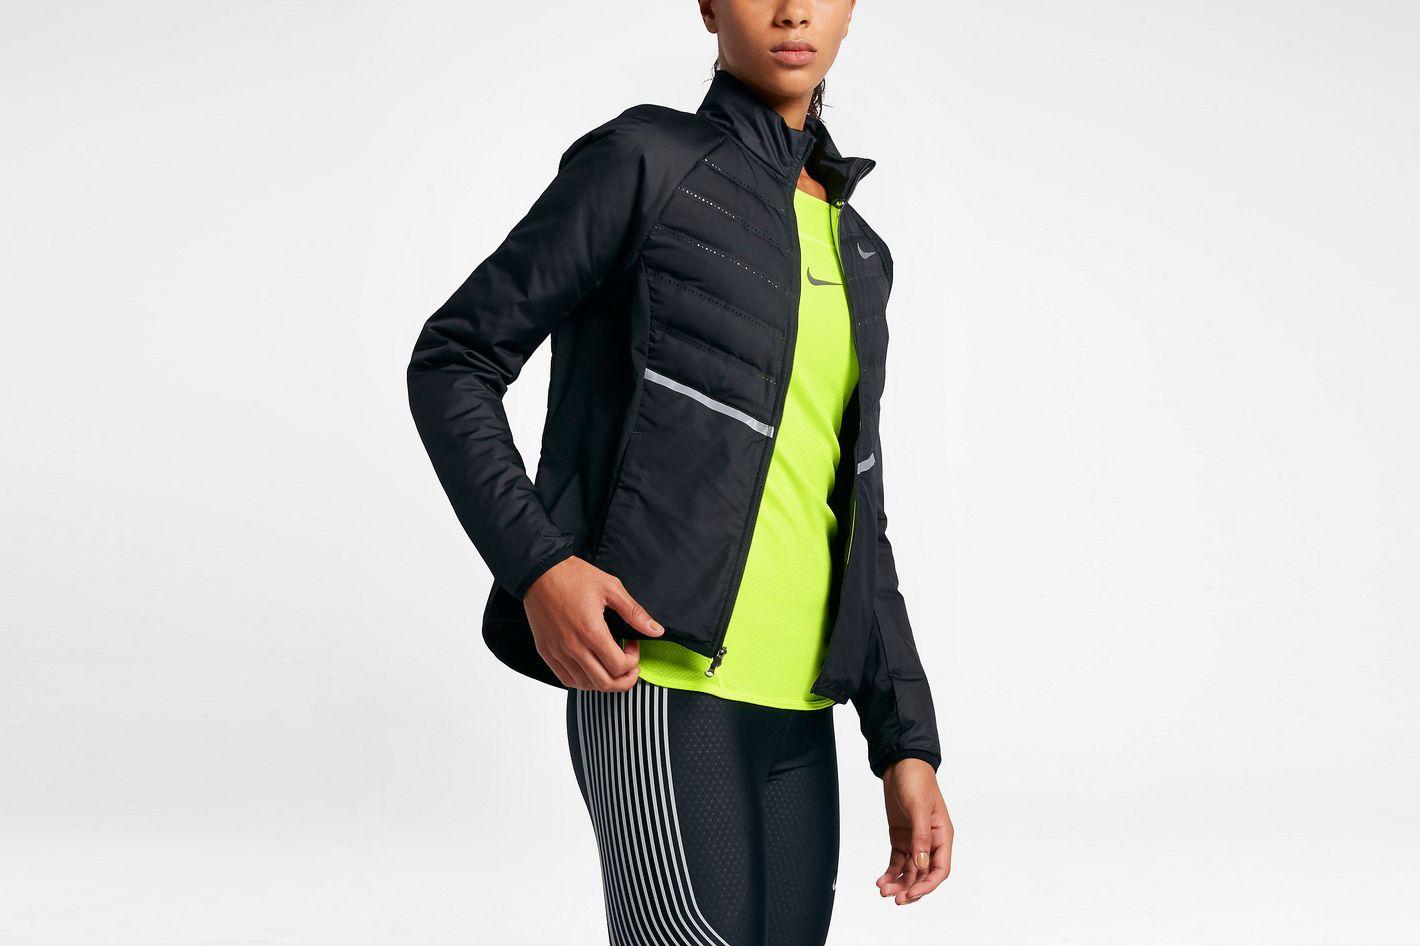 Nike Aeroloft running jacket